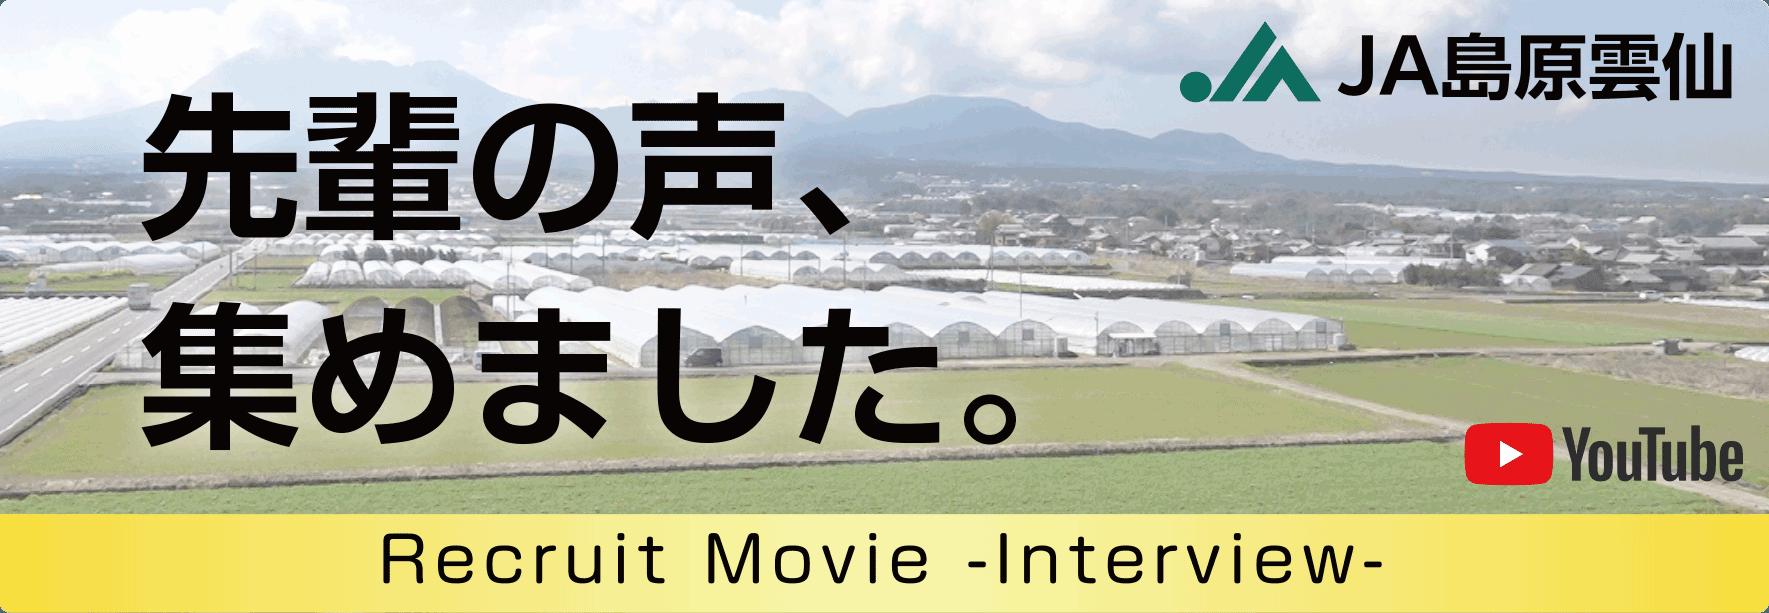 JA島雲リクルート映像へのユーチューブリンク